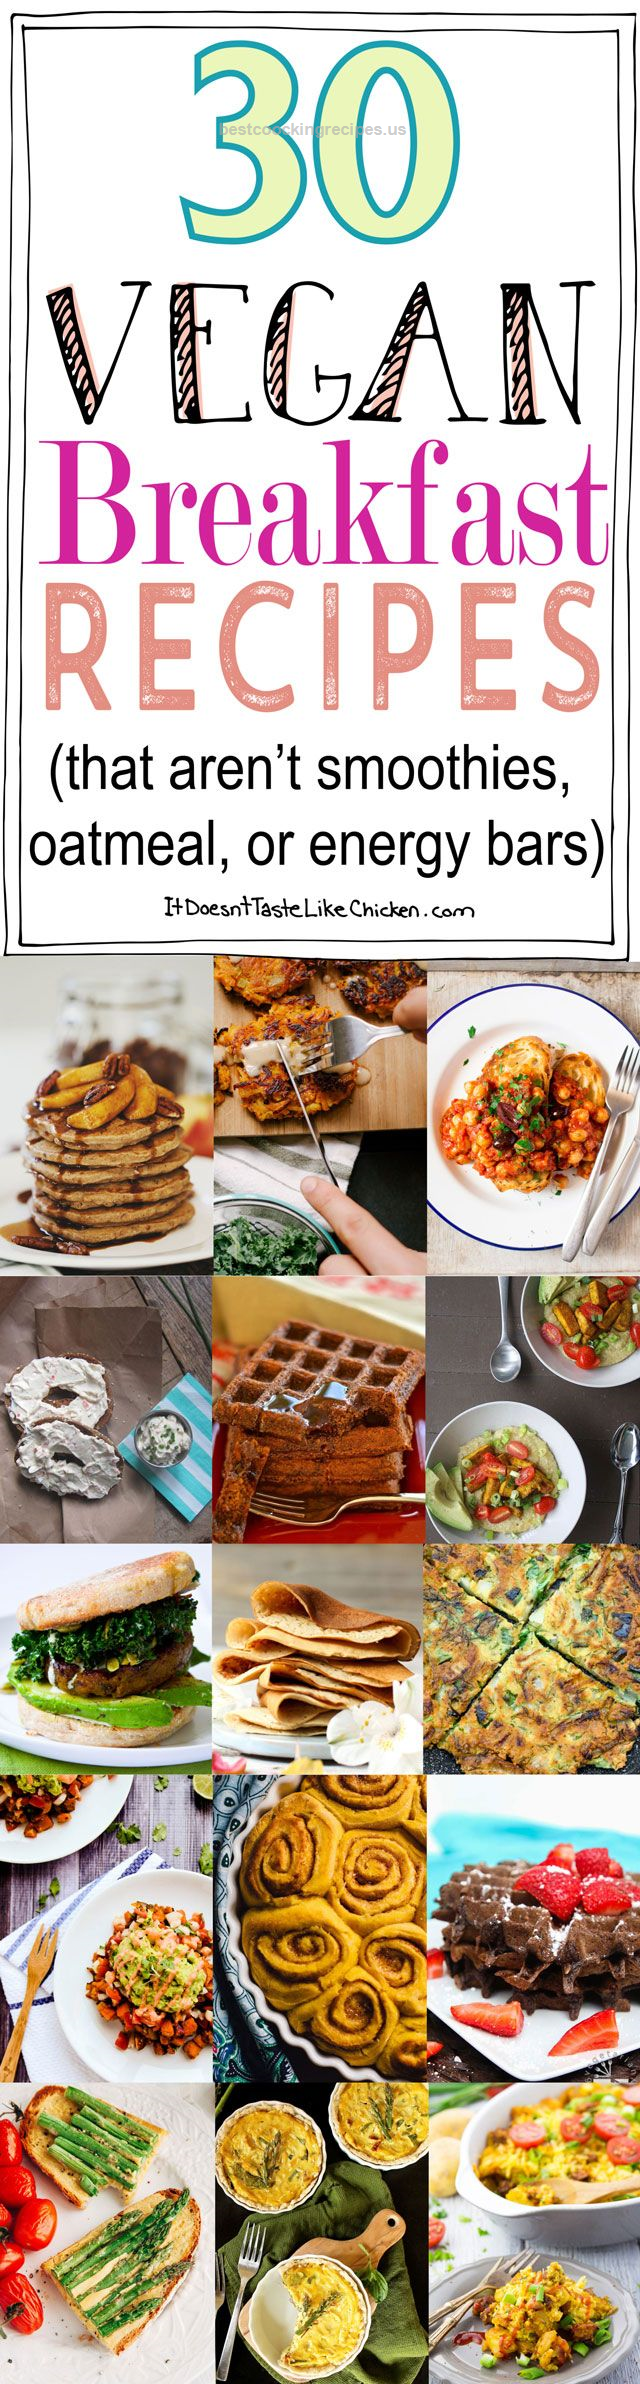 30 Vegan Breakfast Recipes That Aren T Smoothies Oatmeal Or Energy Bars It Doesn T Taste Like Chicken Vegan Dishes Vegan Breakfast Recipes Vegan Recipes